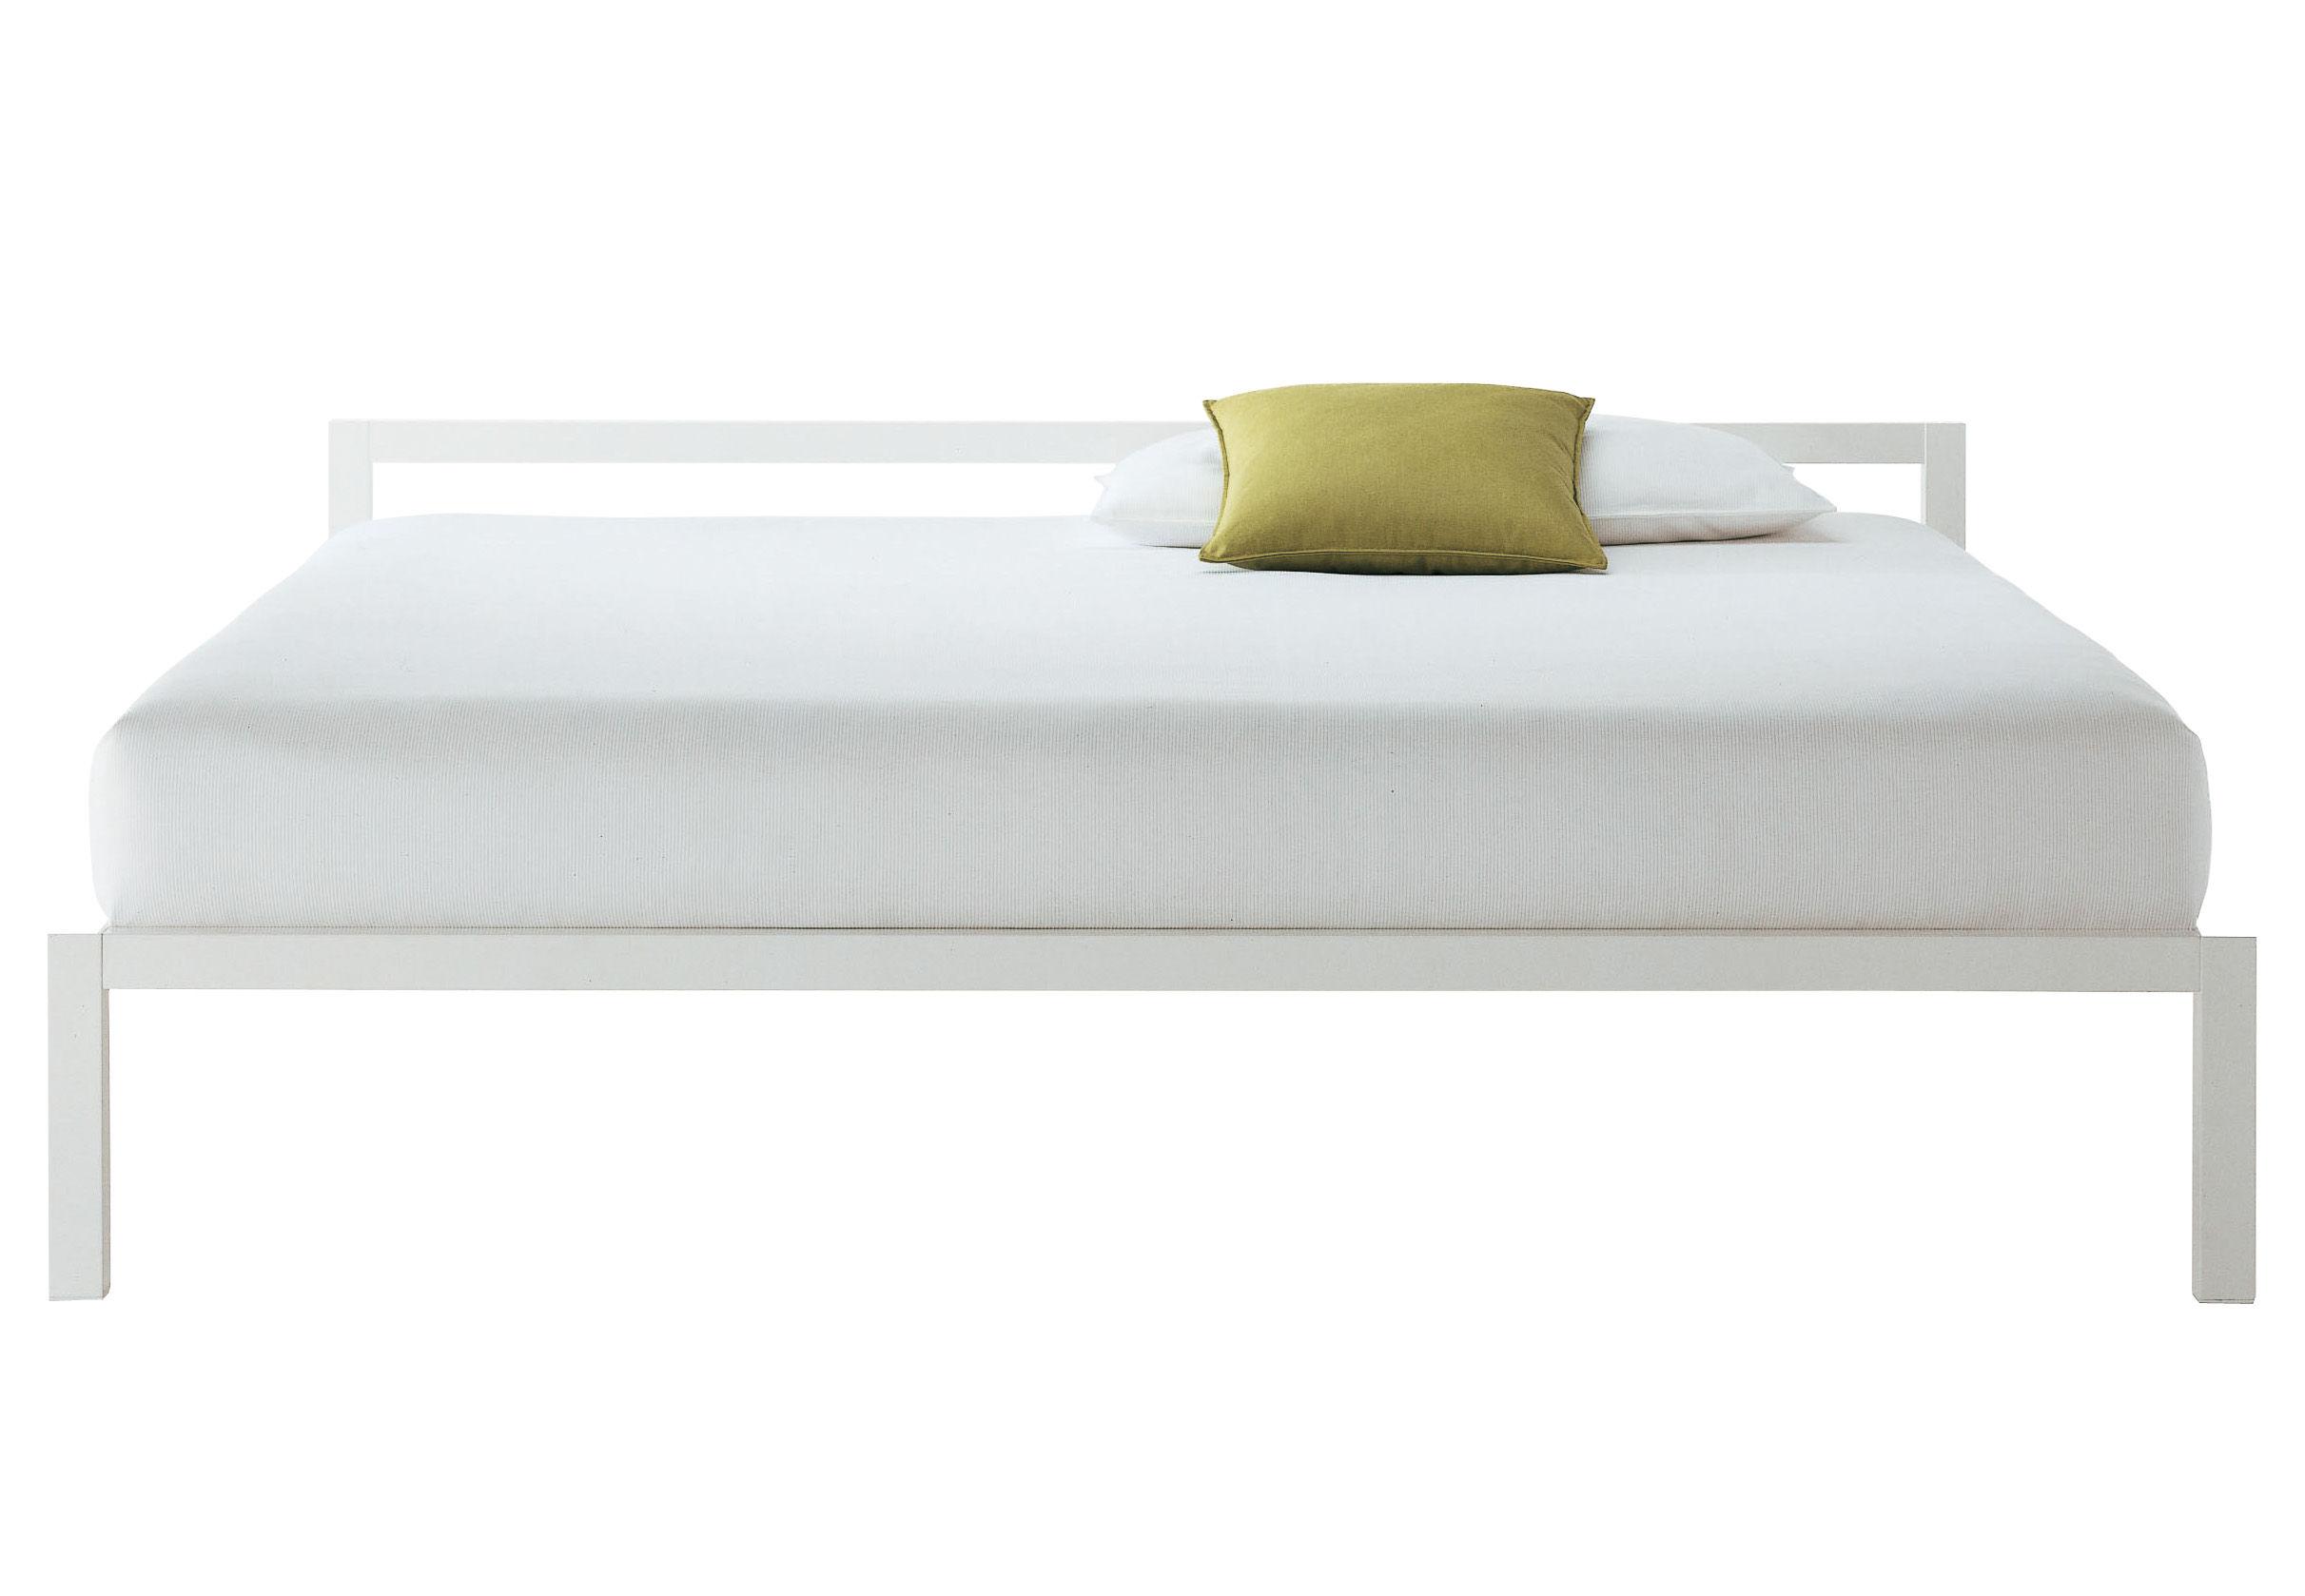 Double Bedbase By Mdf Italia Slat Base 160 X 200 Cm L 200 X L 160